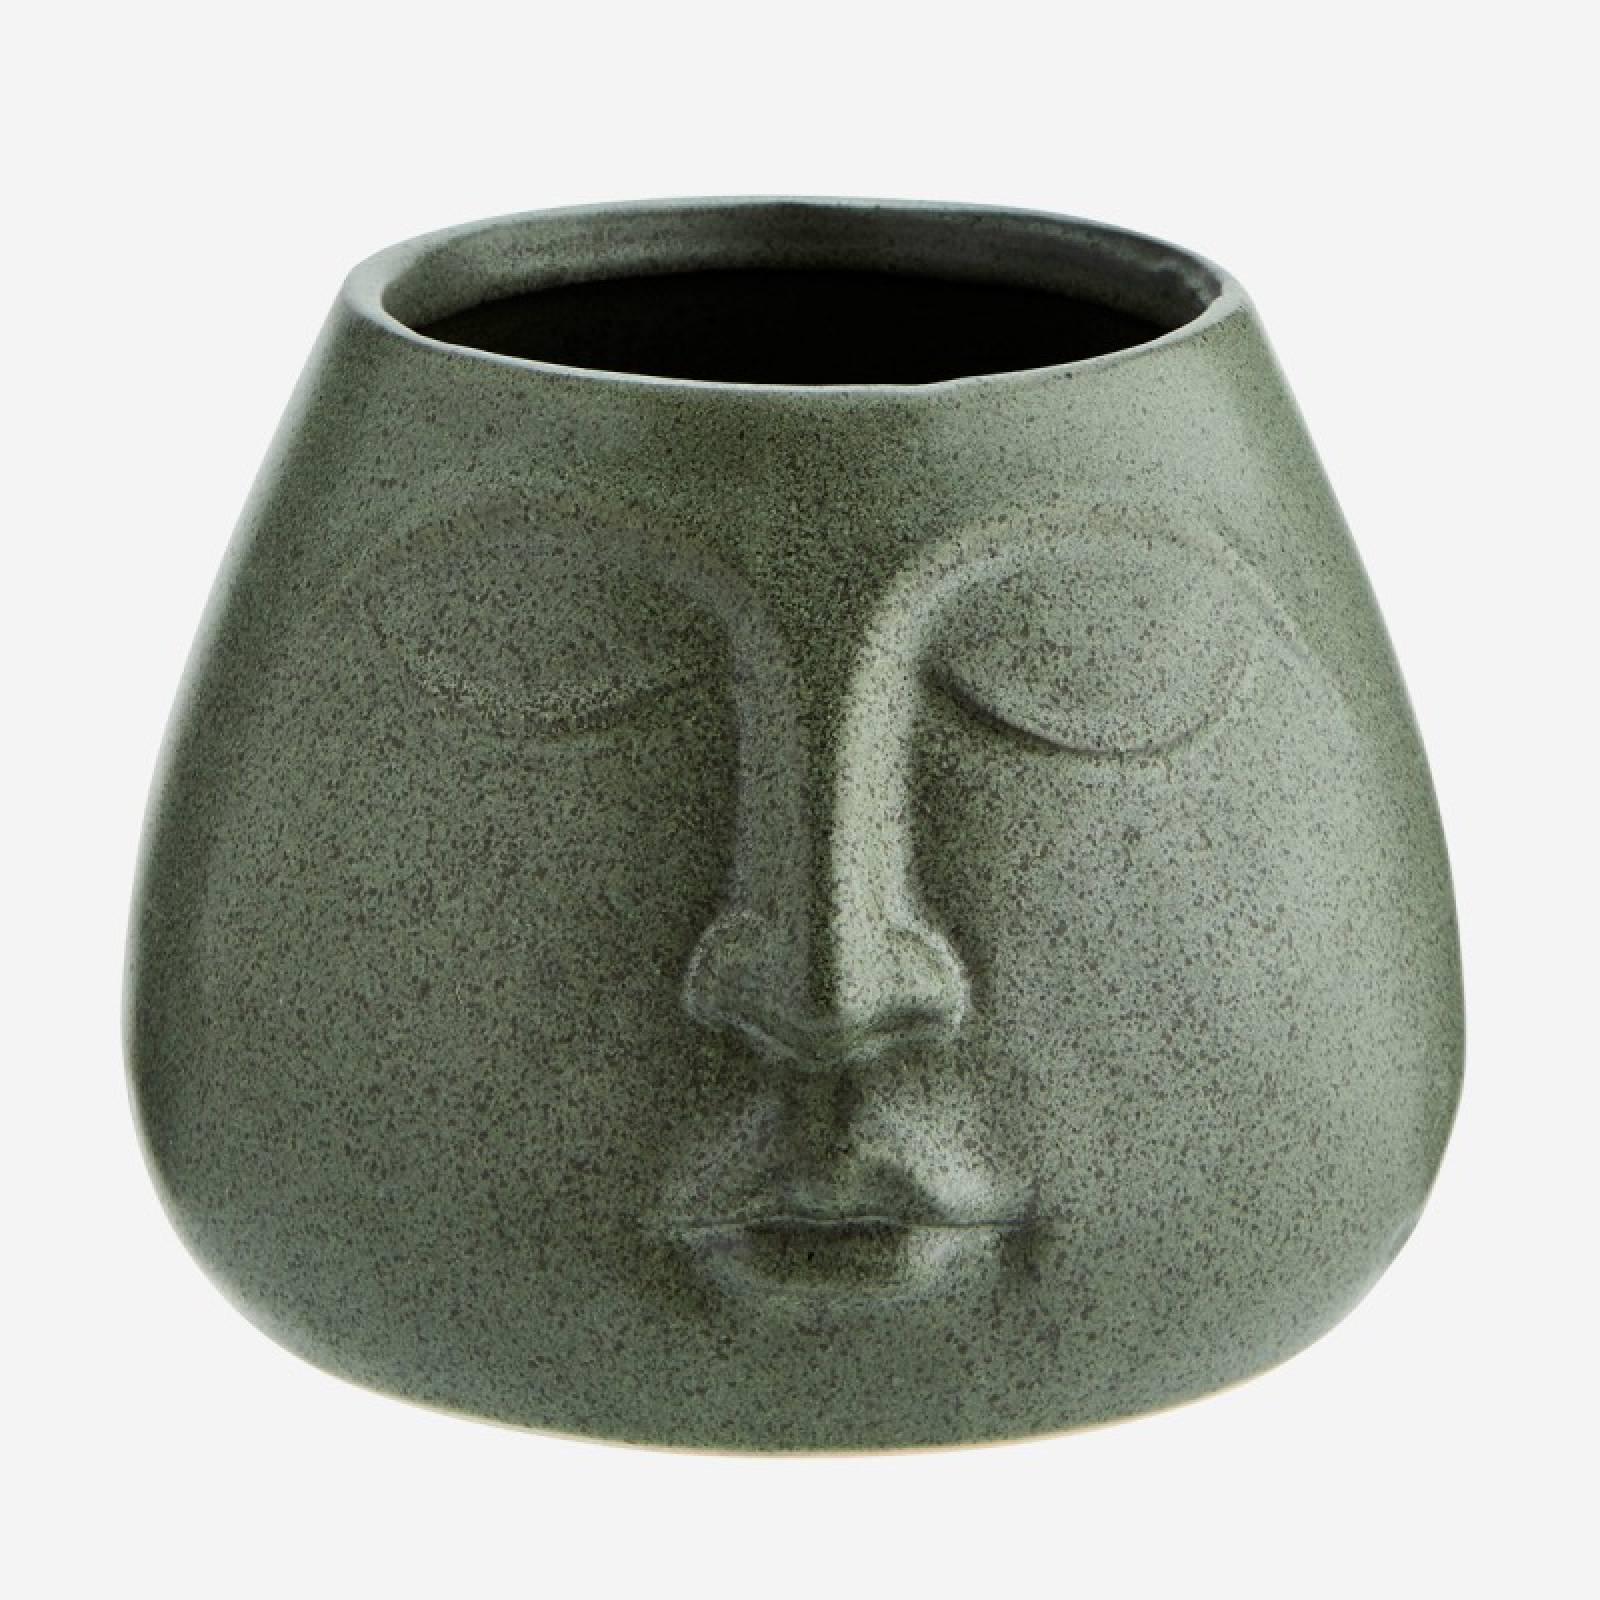 Bulbous Face Imprint Vase In Green